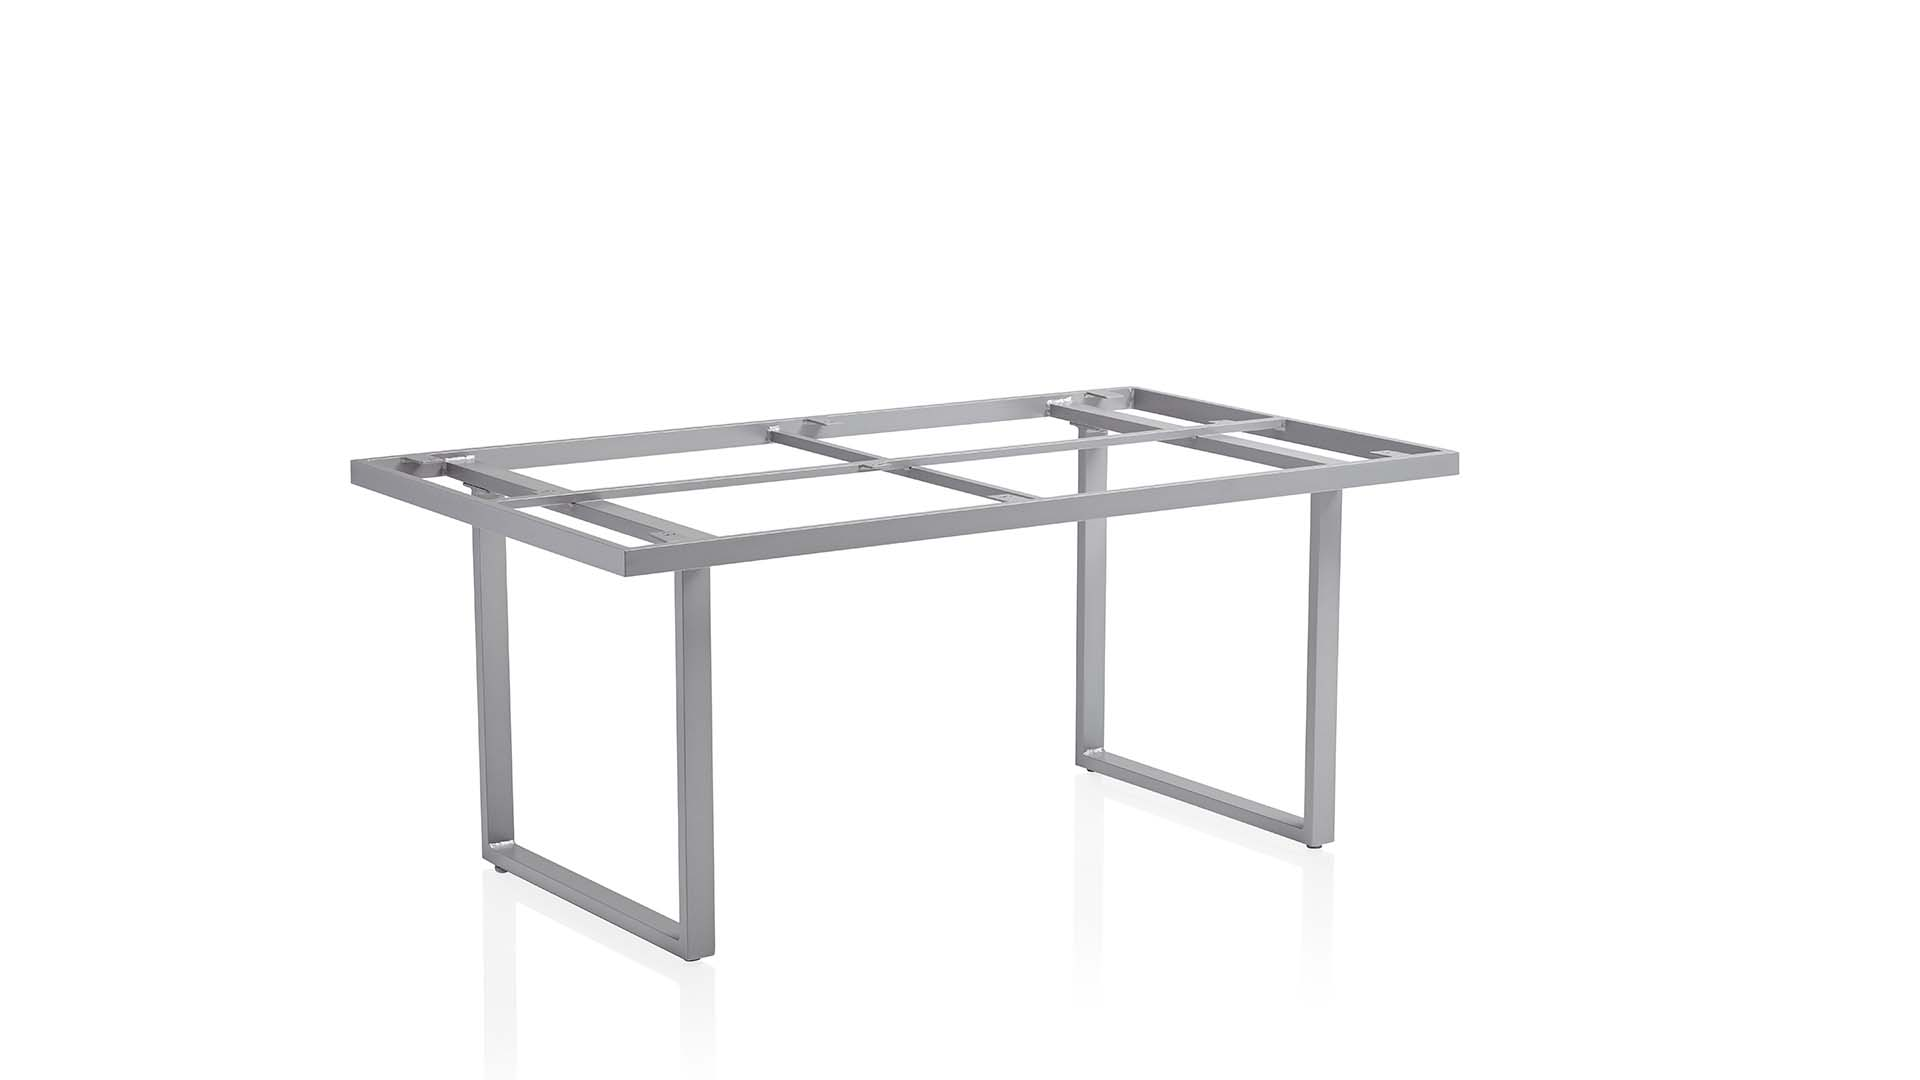 SKATE Casual Dining Tischgestell 160 x 95 cm